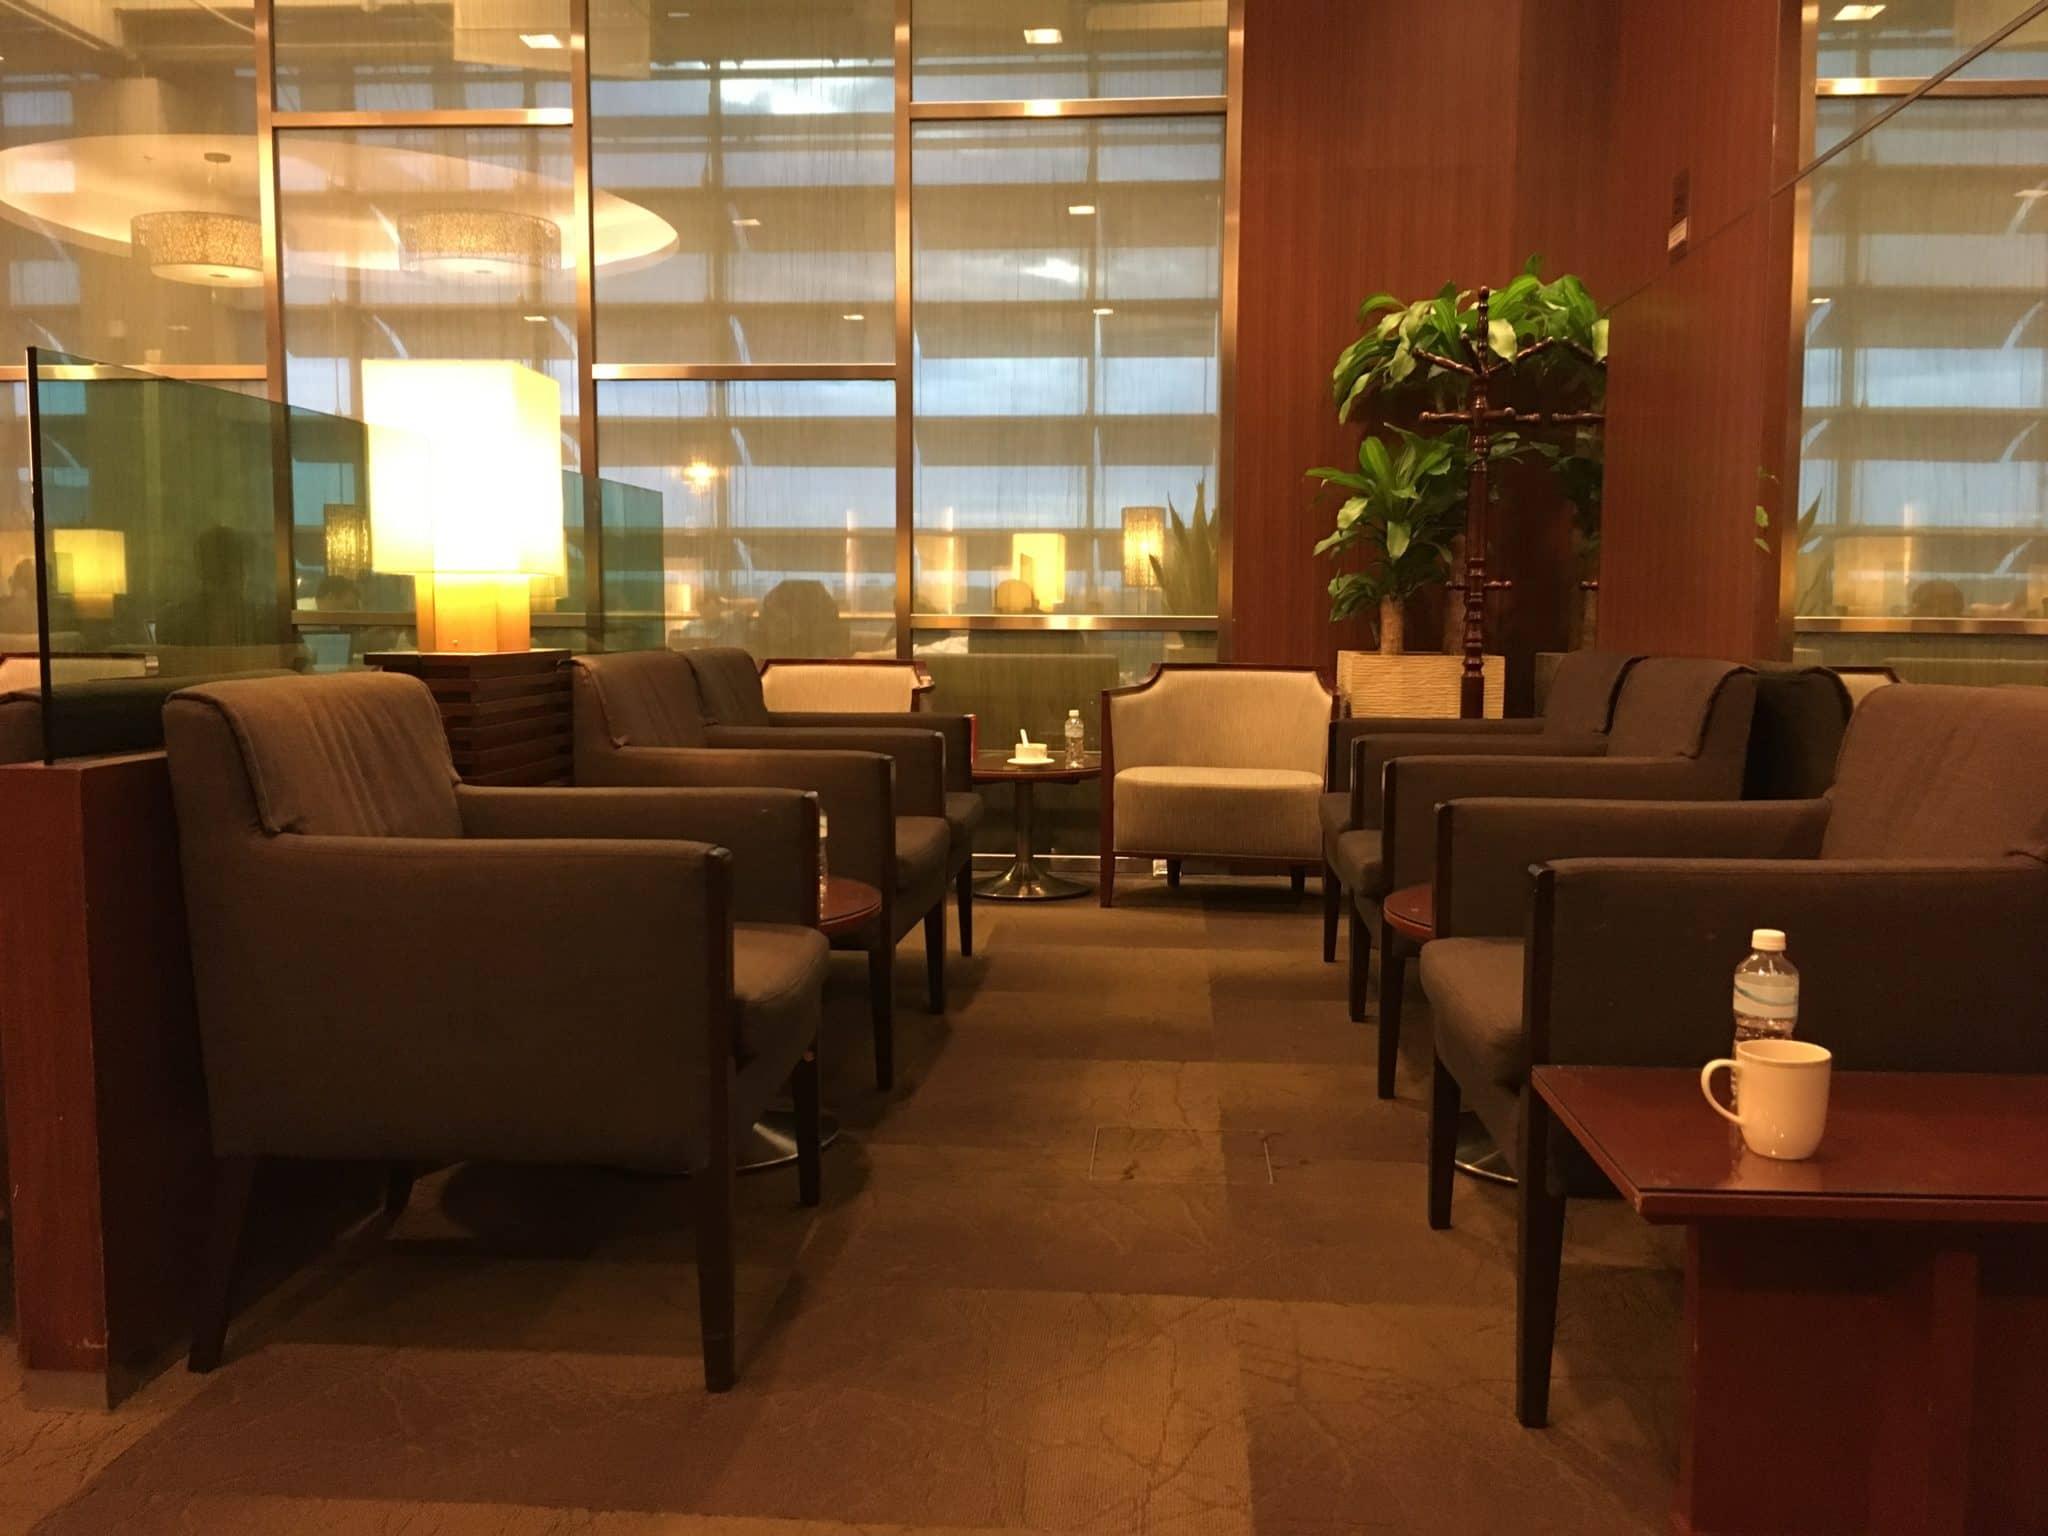 KrisFlyer Gold Lounge Changi Airport Terminal 3 - Sessel innen